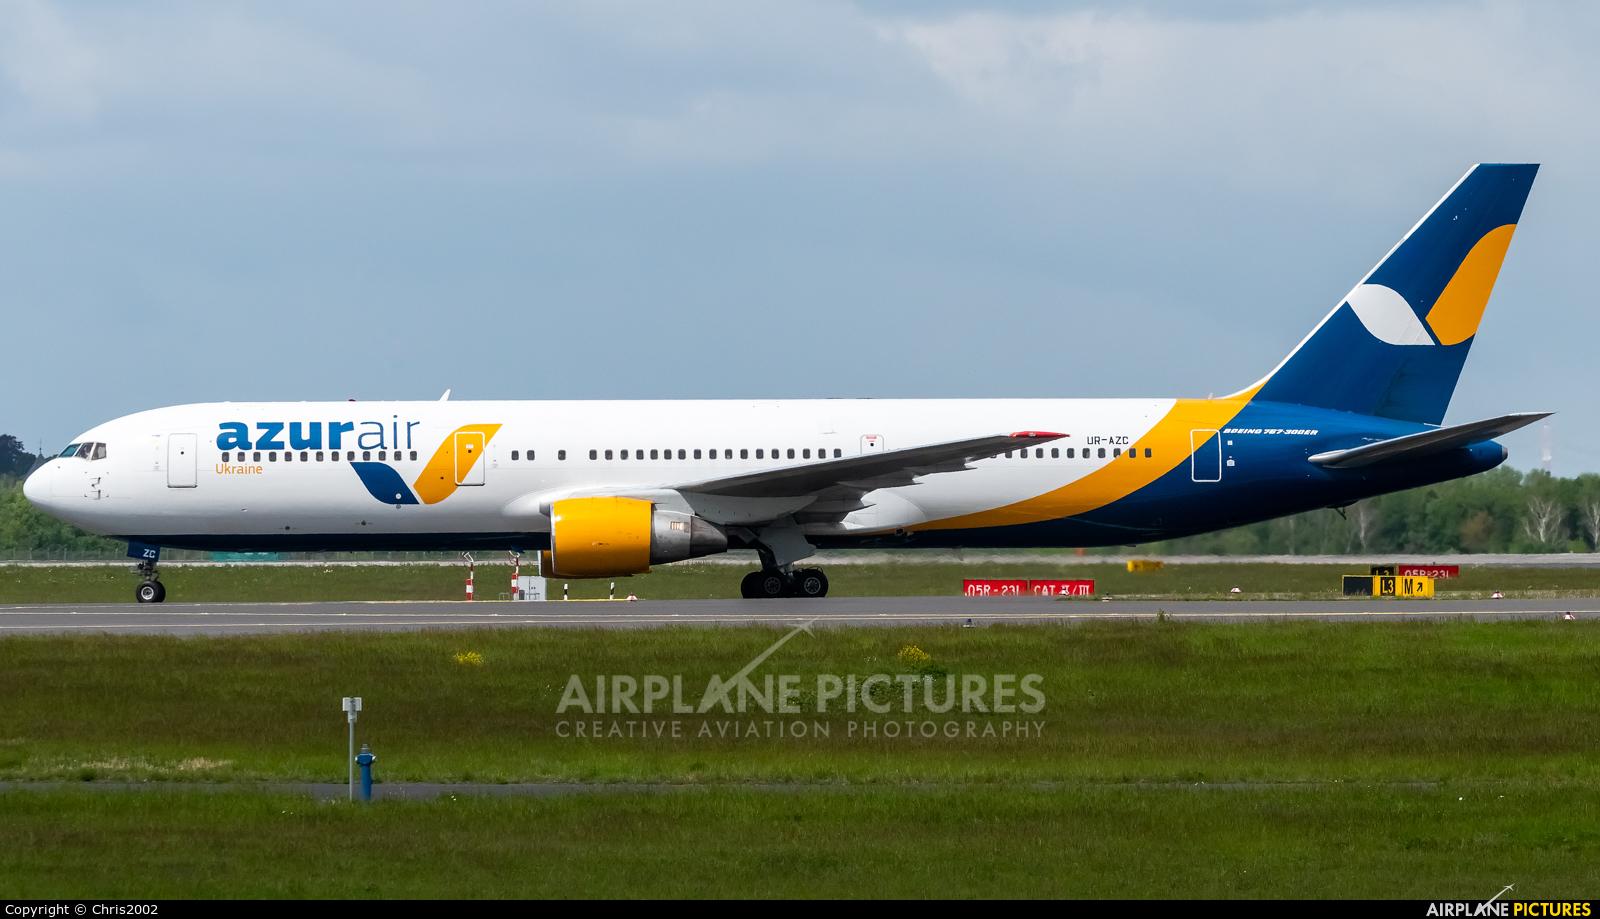 Azur Air Ukraine UR-AZC aircraft at Düsseldorf